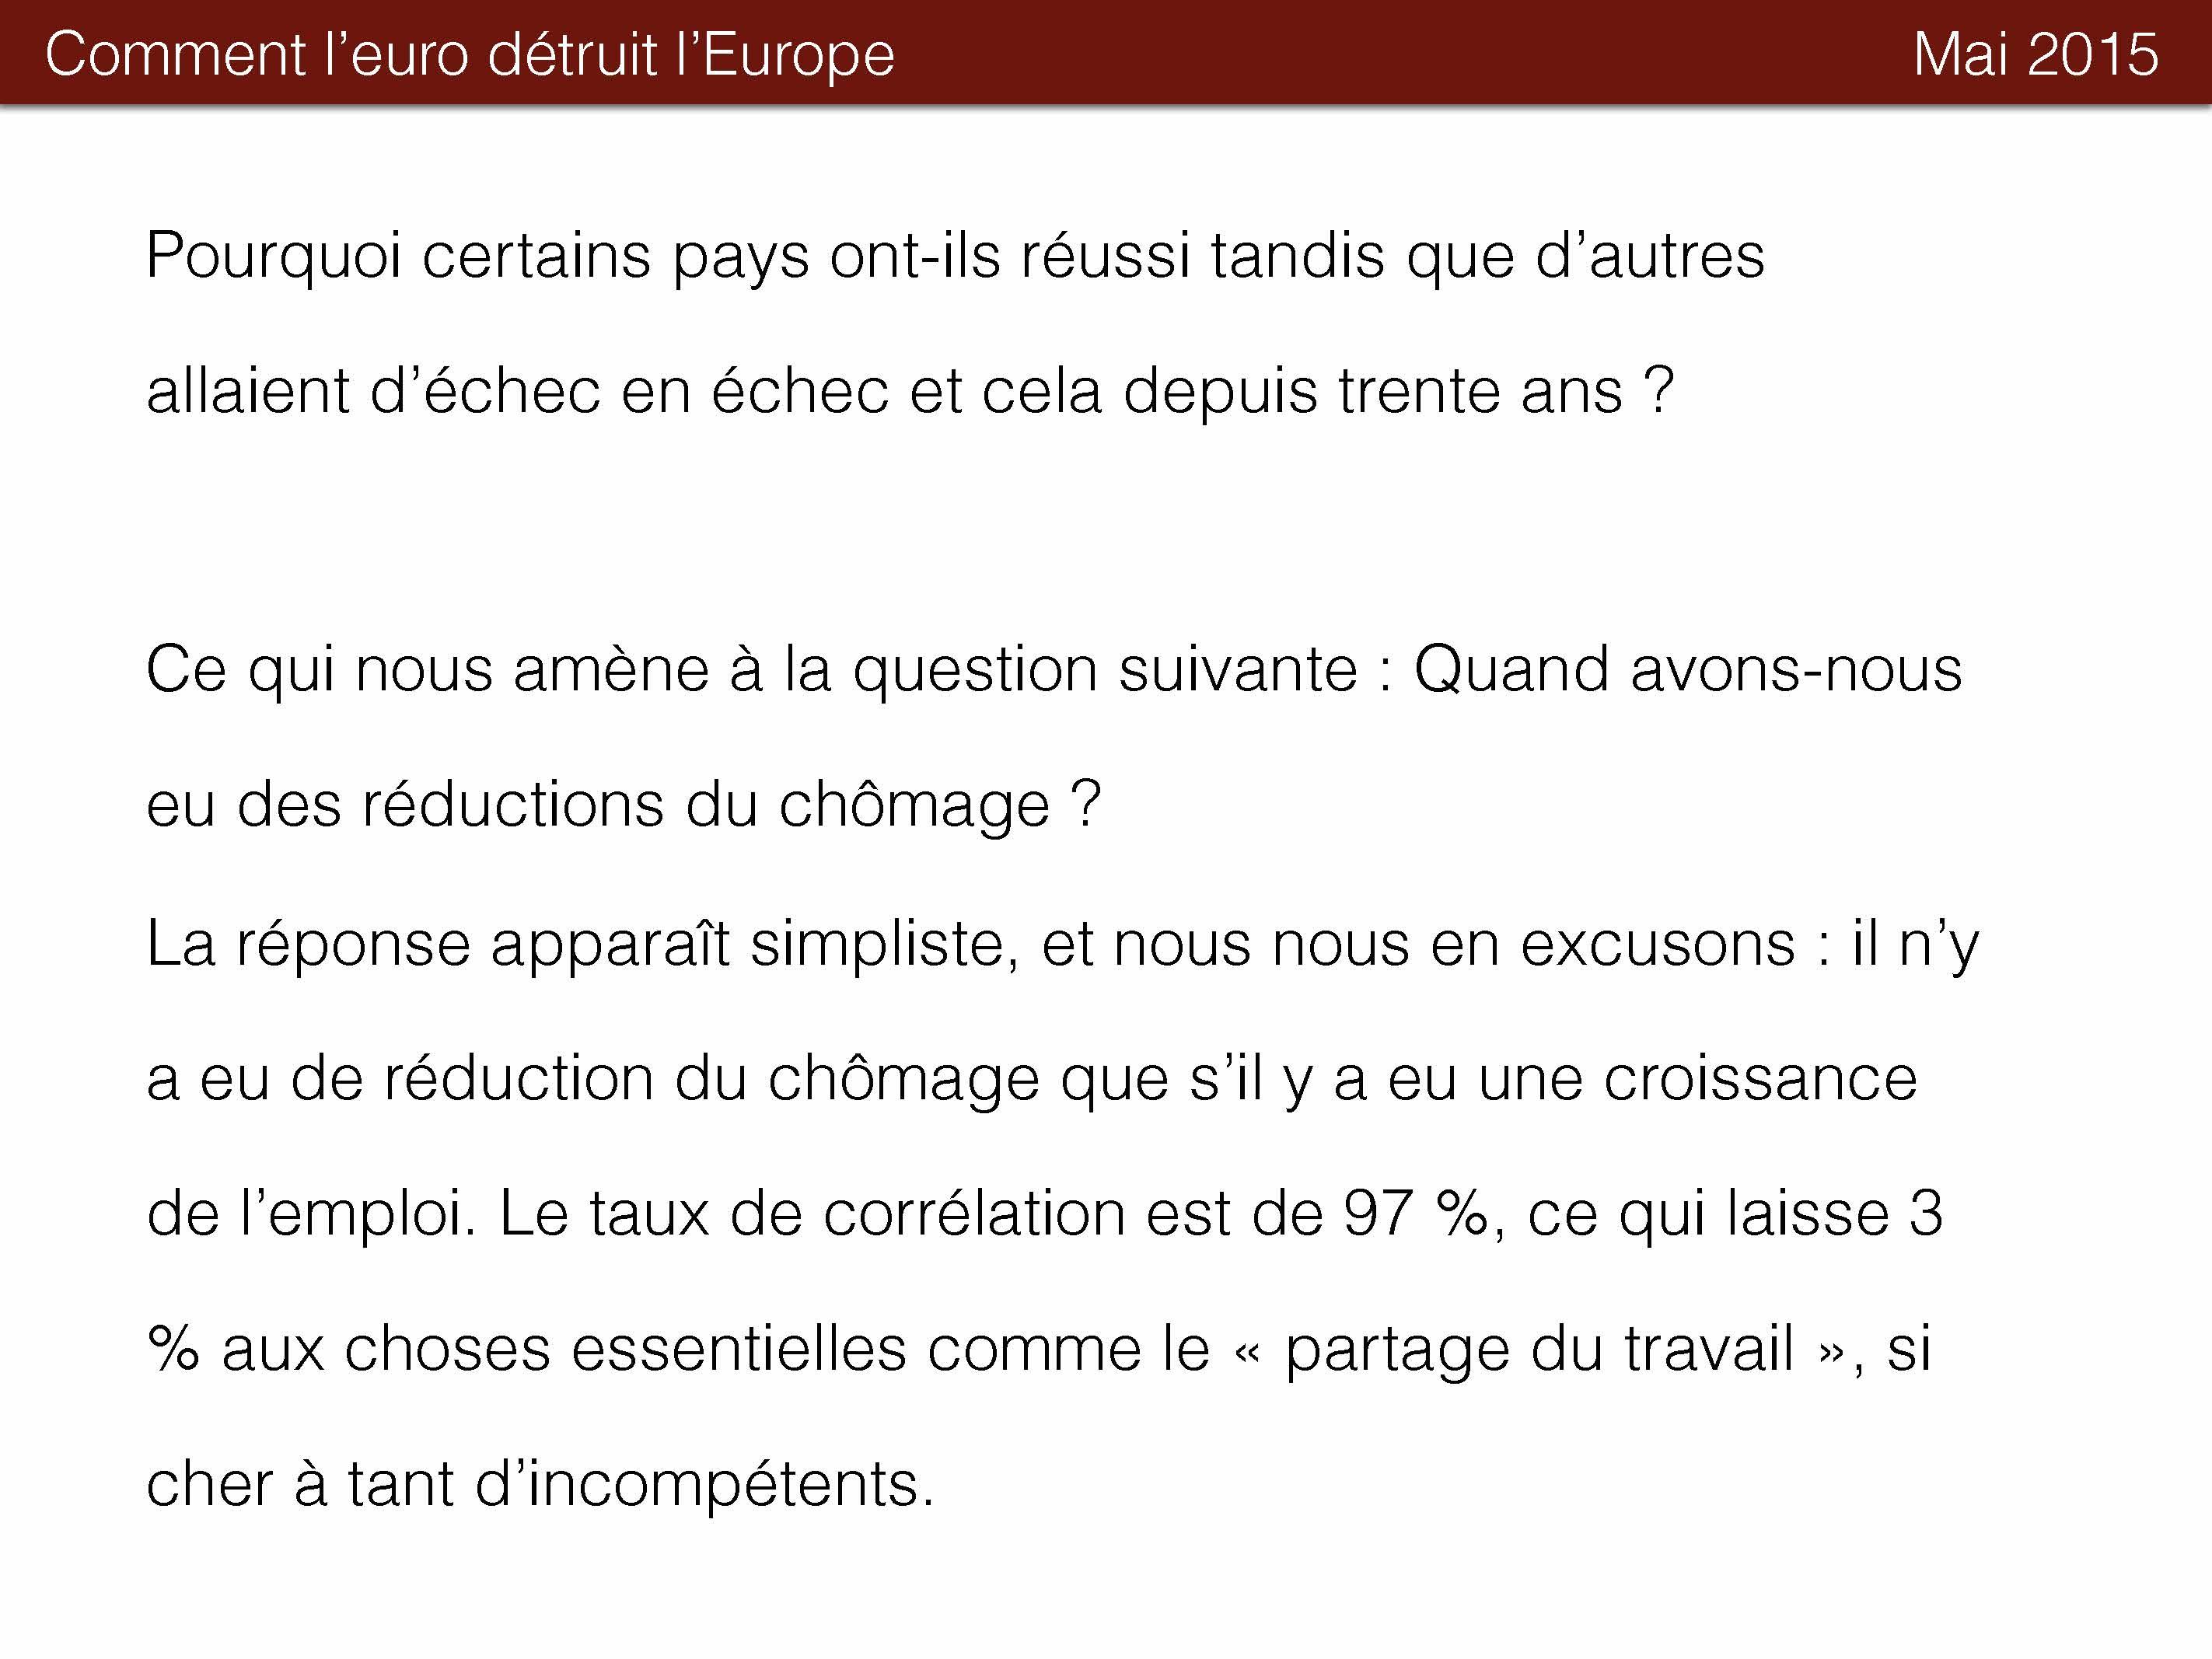 EUro_Page_21